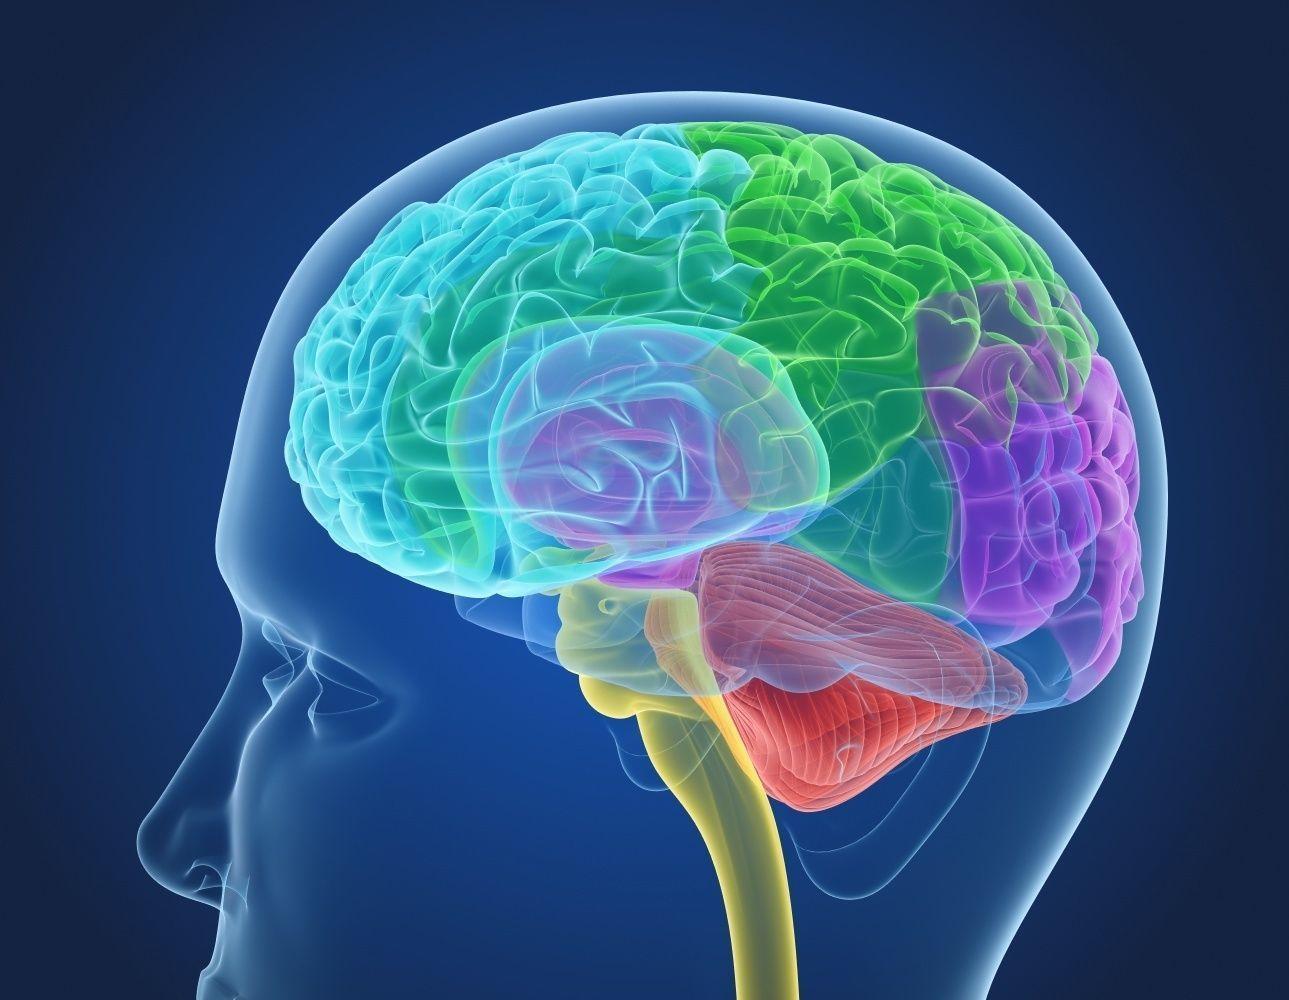 Xray Brain anatomy with inner structure